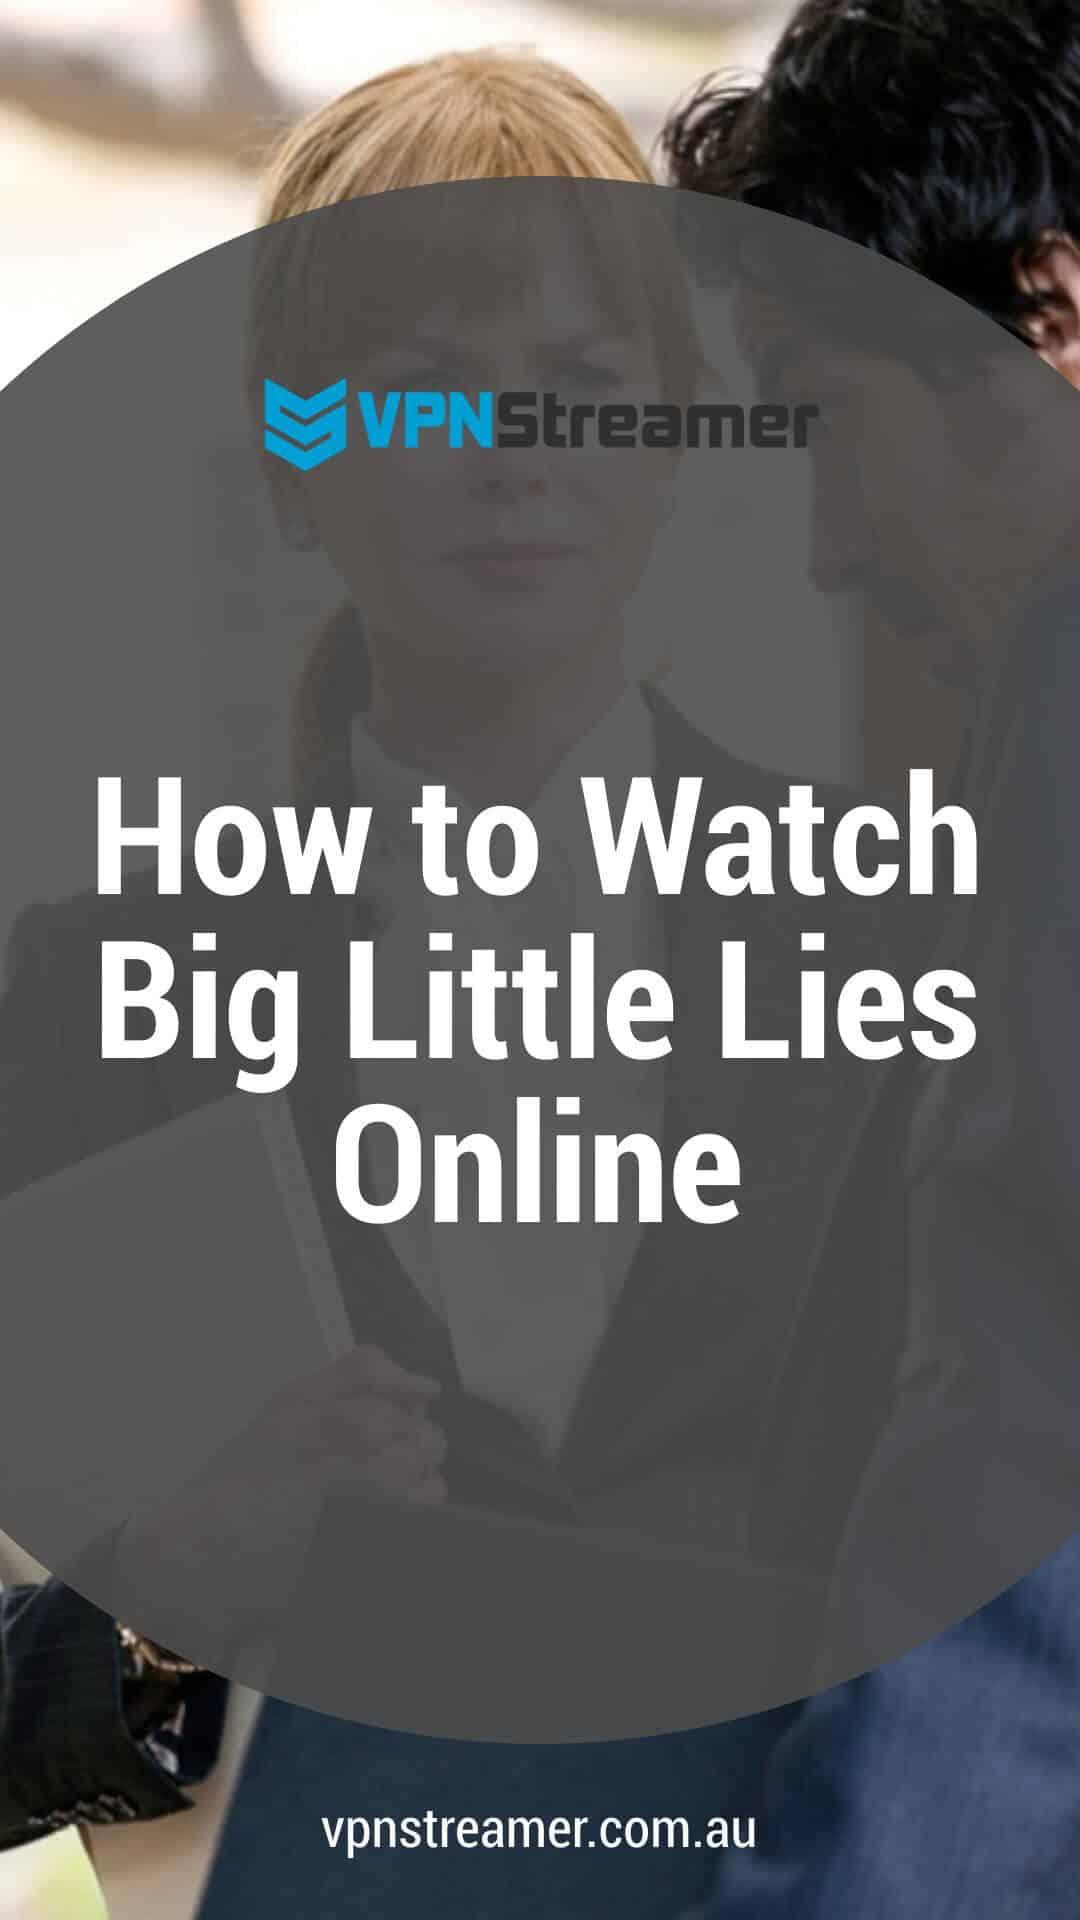 How to Watch Big Little Lies Online